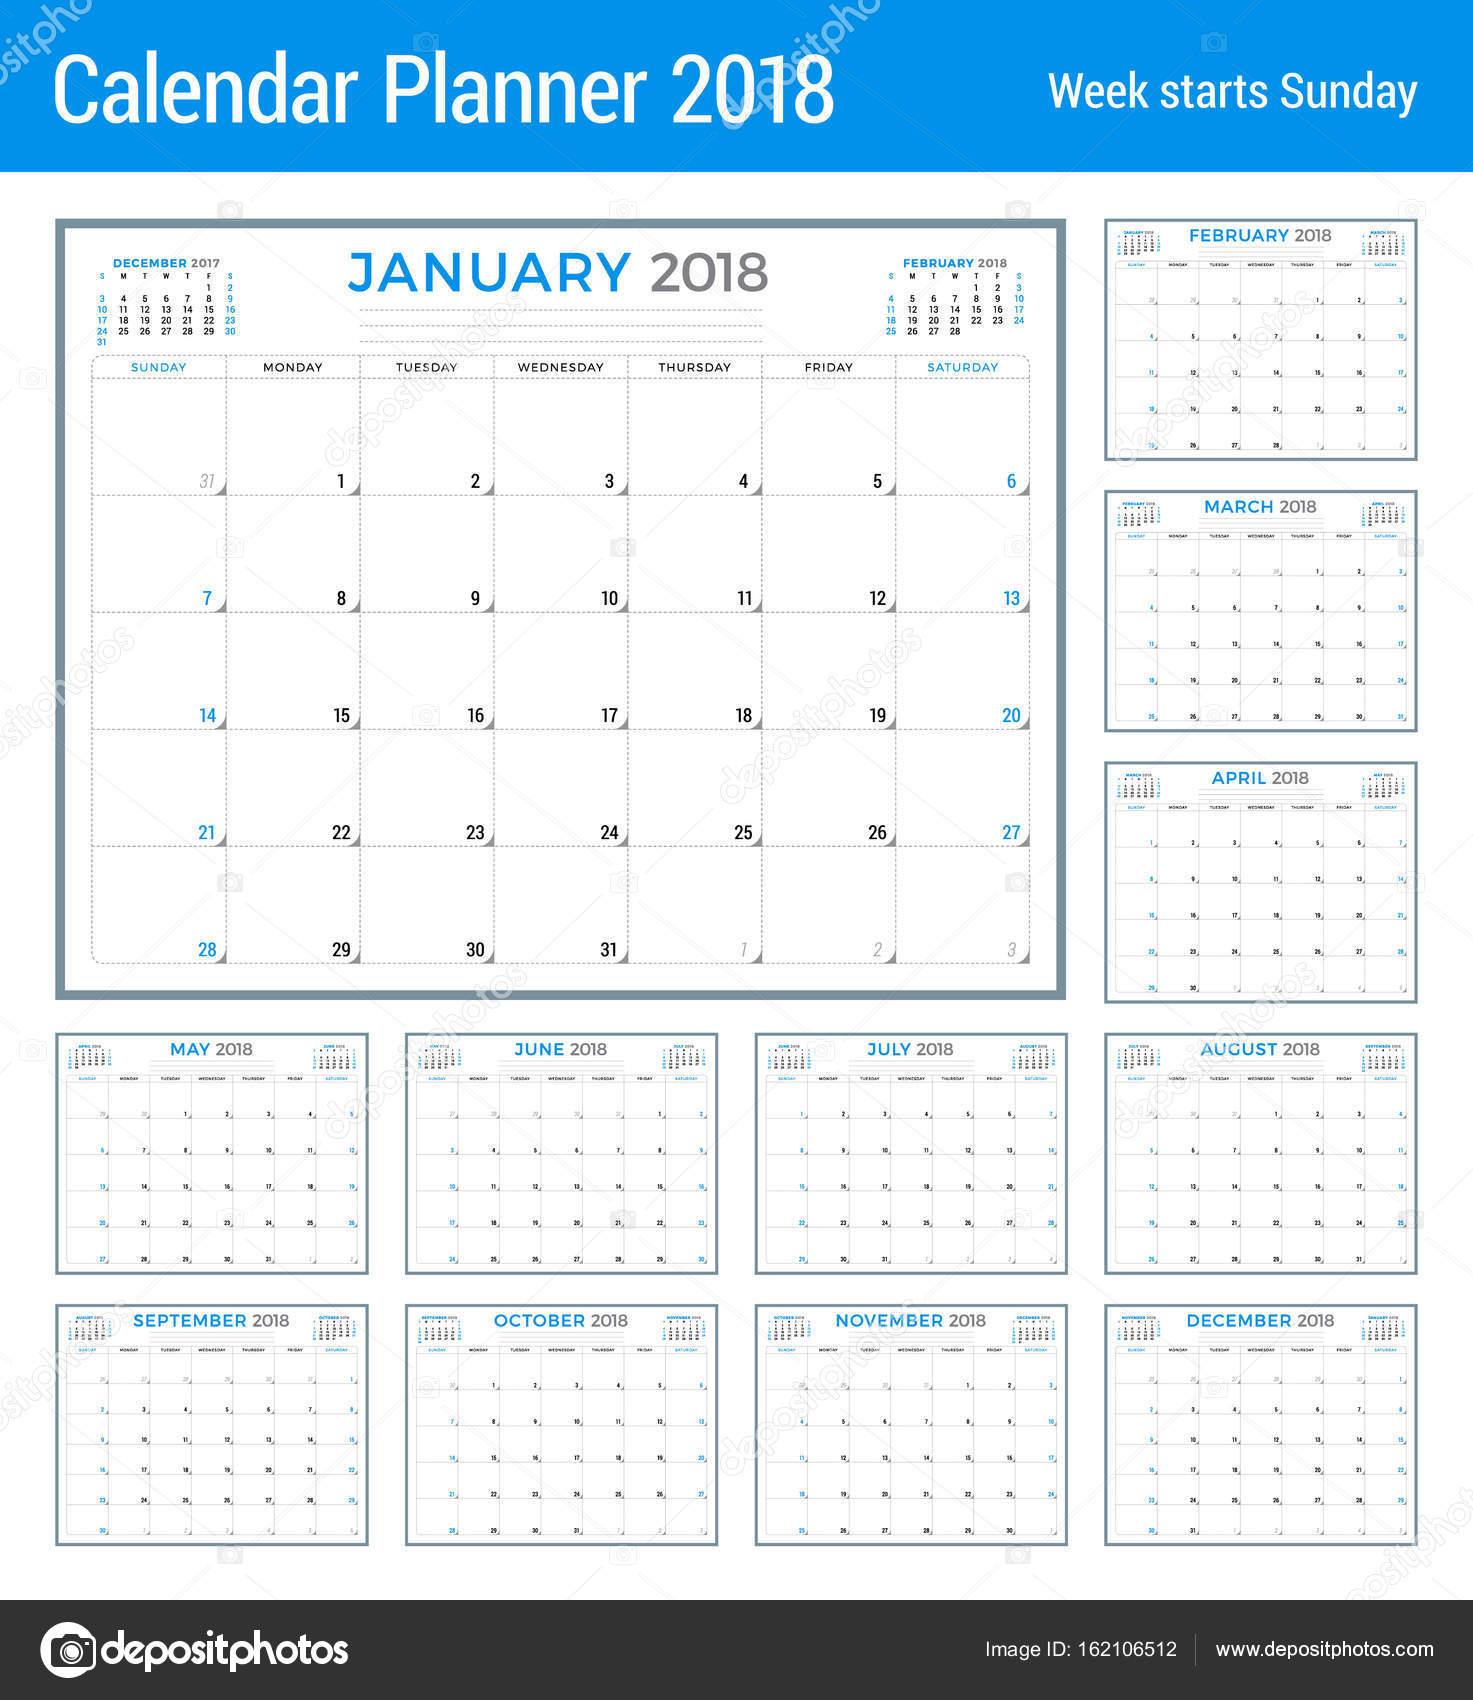 Calendar Planner Nodejs : 年的日历日程备忘录。矢量设计模板。周从星期日开始。文具设计。组的 个月 — 图库矢量图像